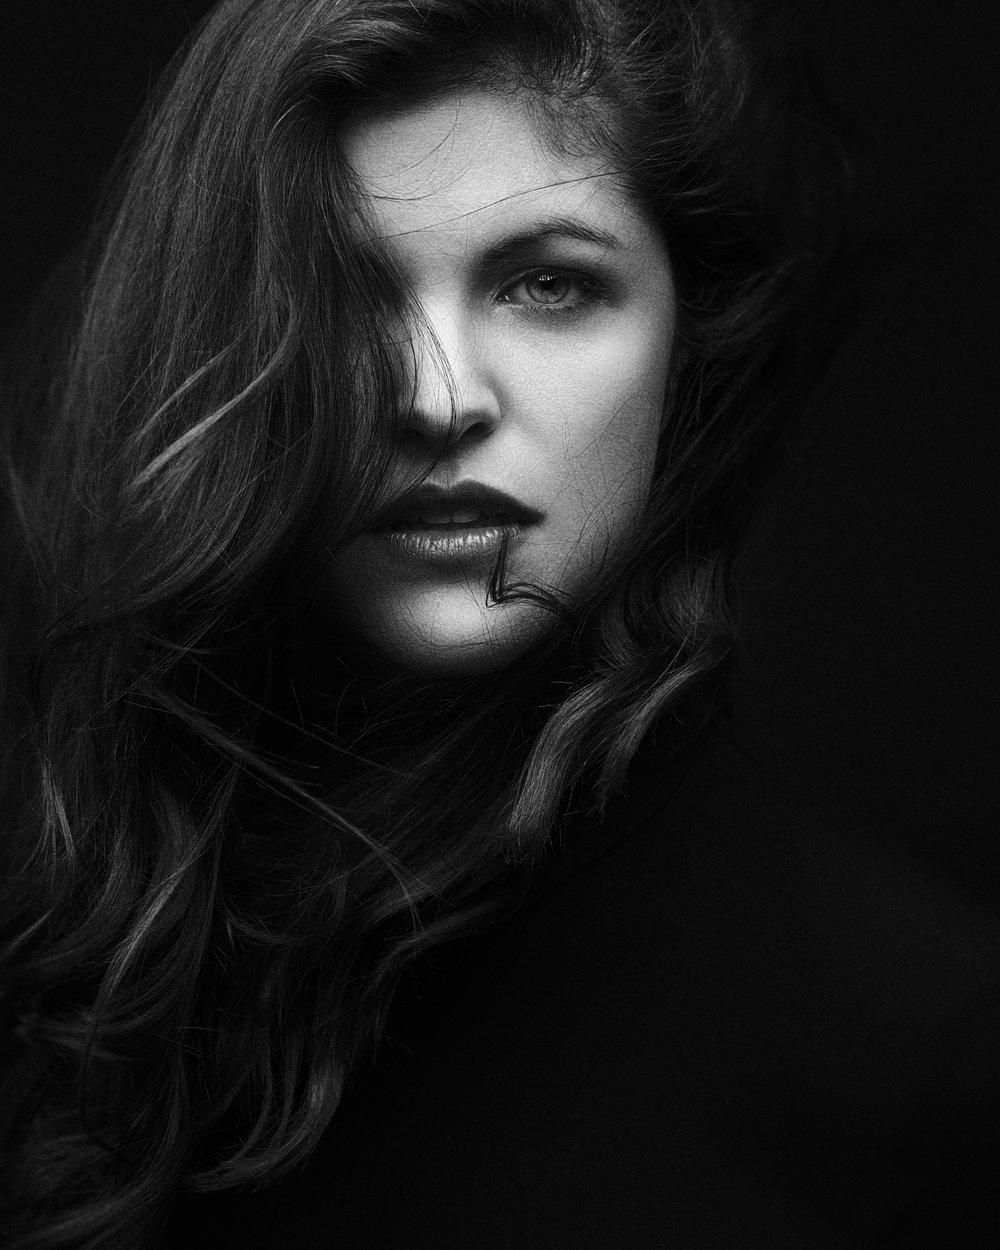 Lauren Shippen | Portrait Session by Jon Sams